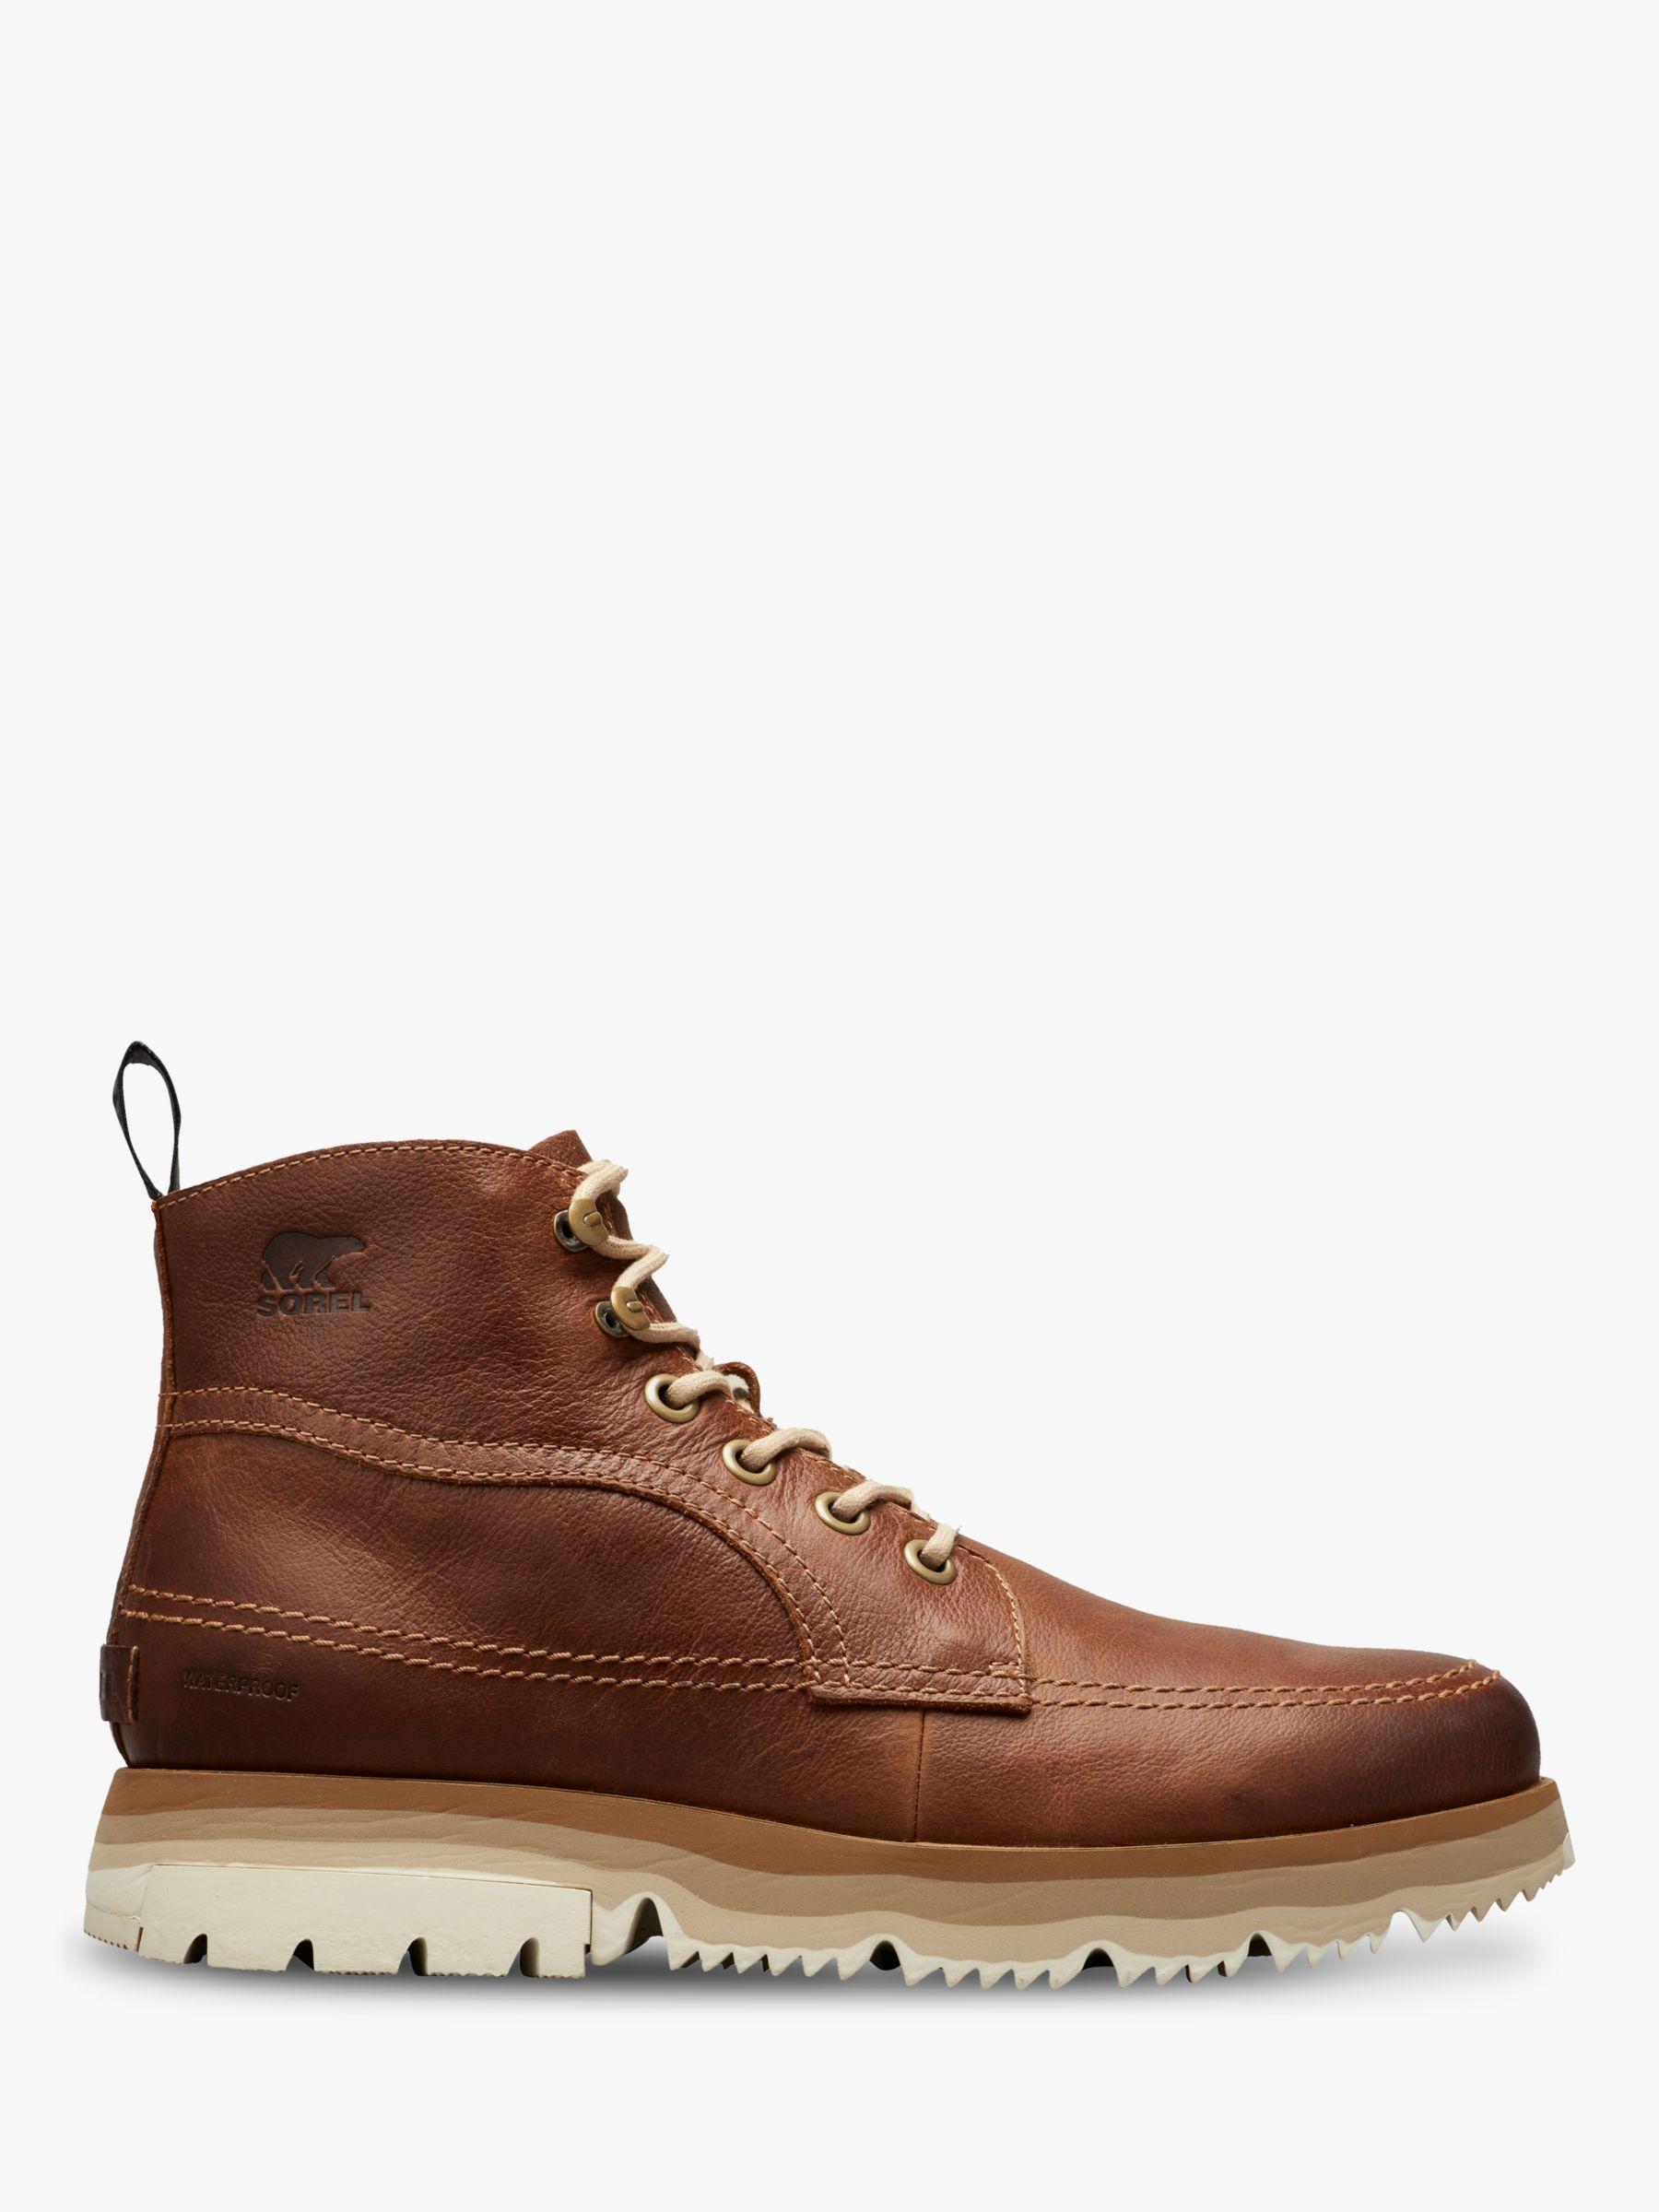 Sorel SOREL Atlis Leather Chukka Boots, Elk